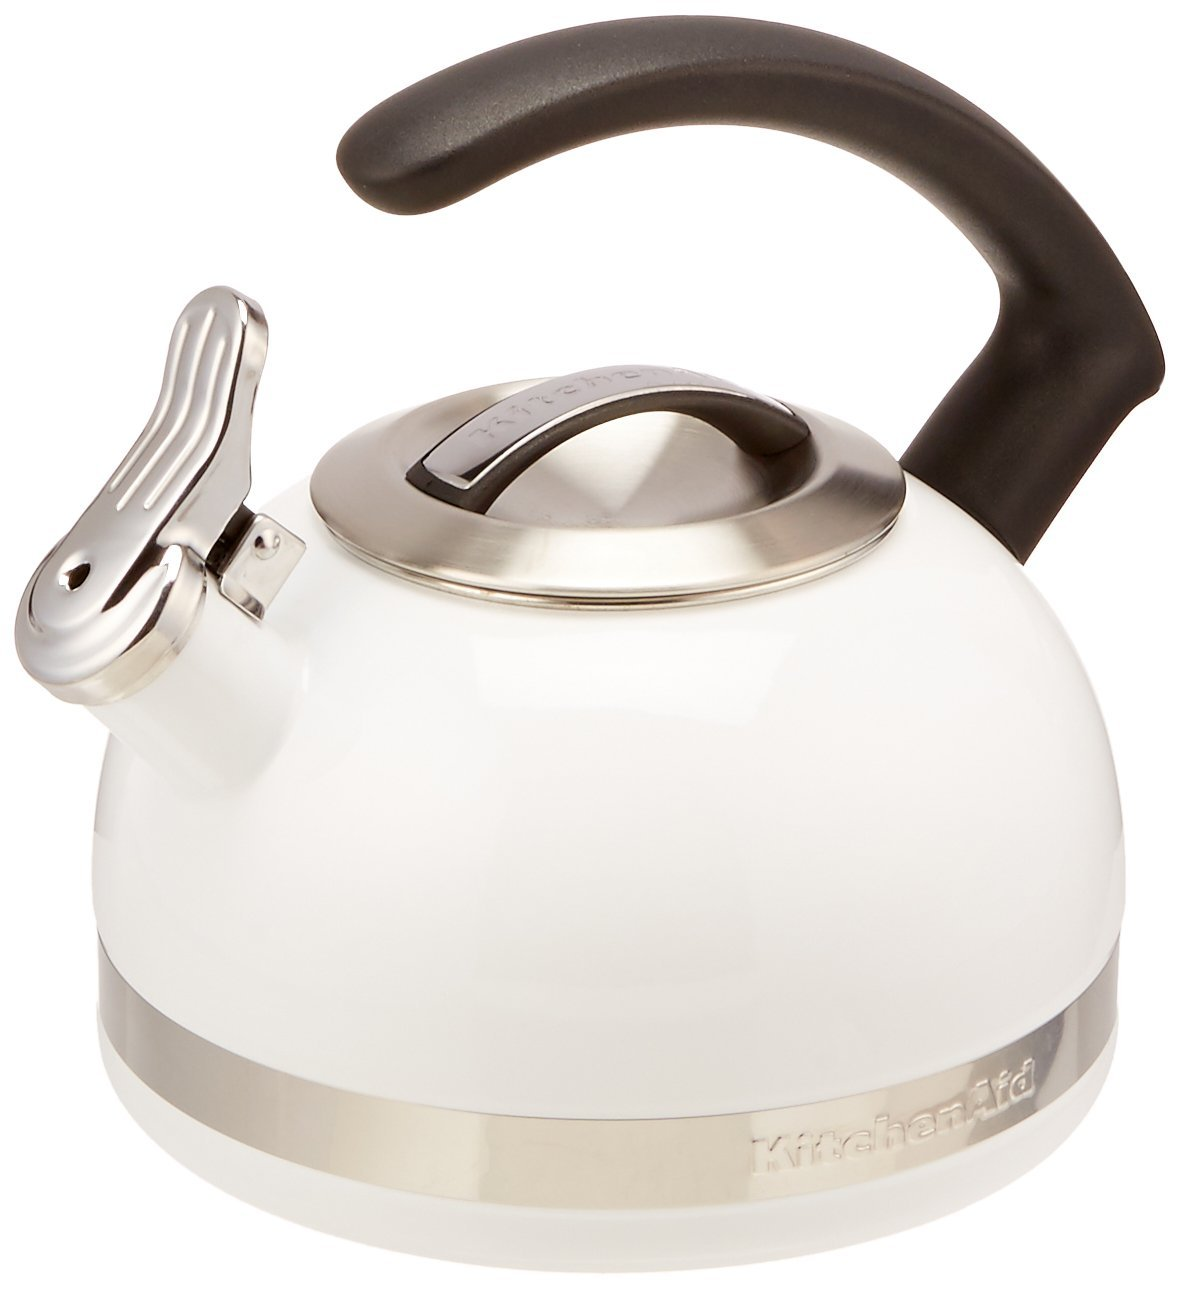 KitchenAid 2-Quart Kettle ONLY...